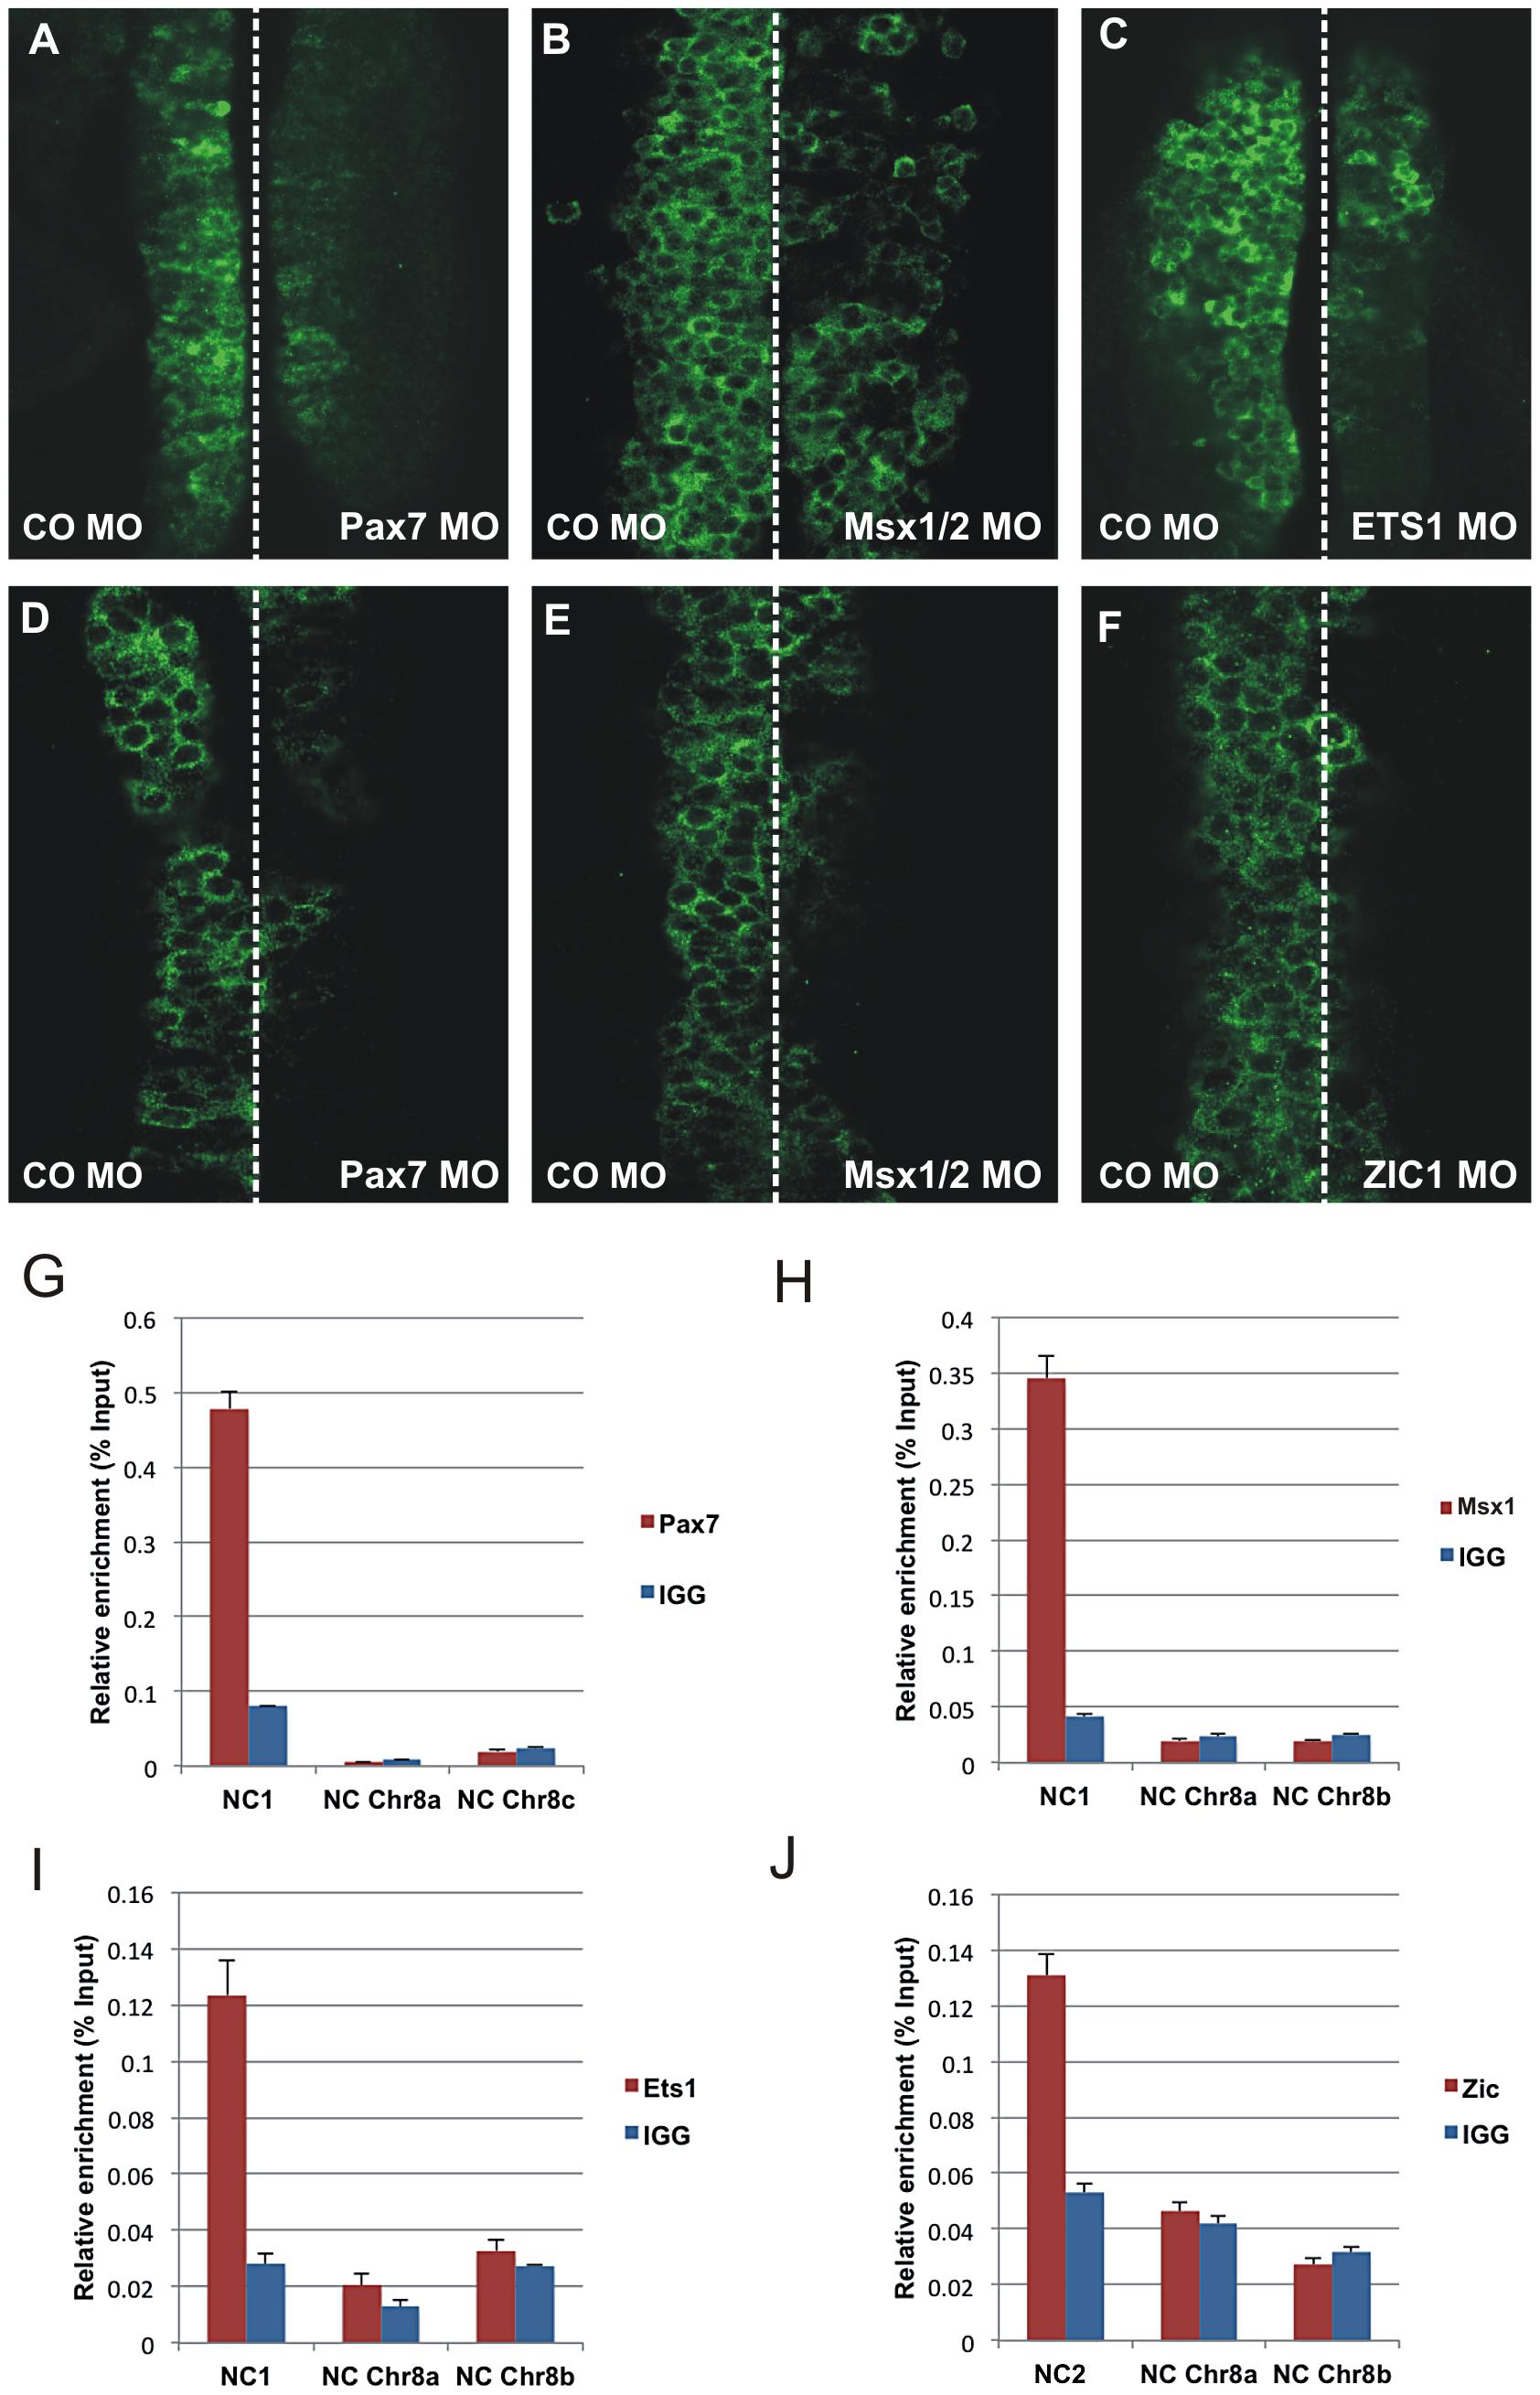 Effect of morpholino-mediated knockdown and chromatin immunoprecipitation.